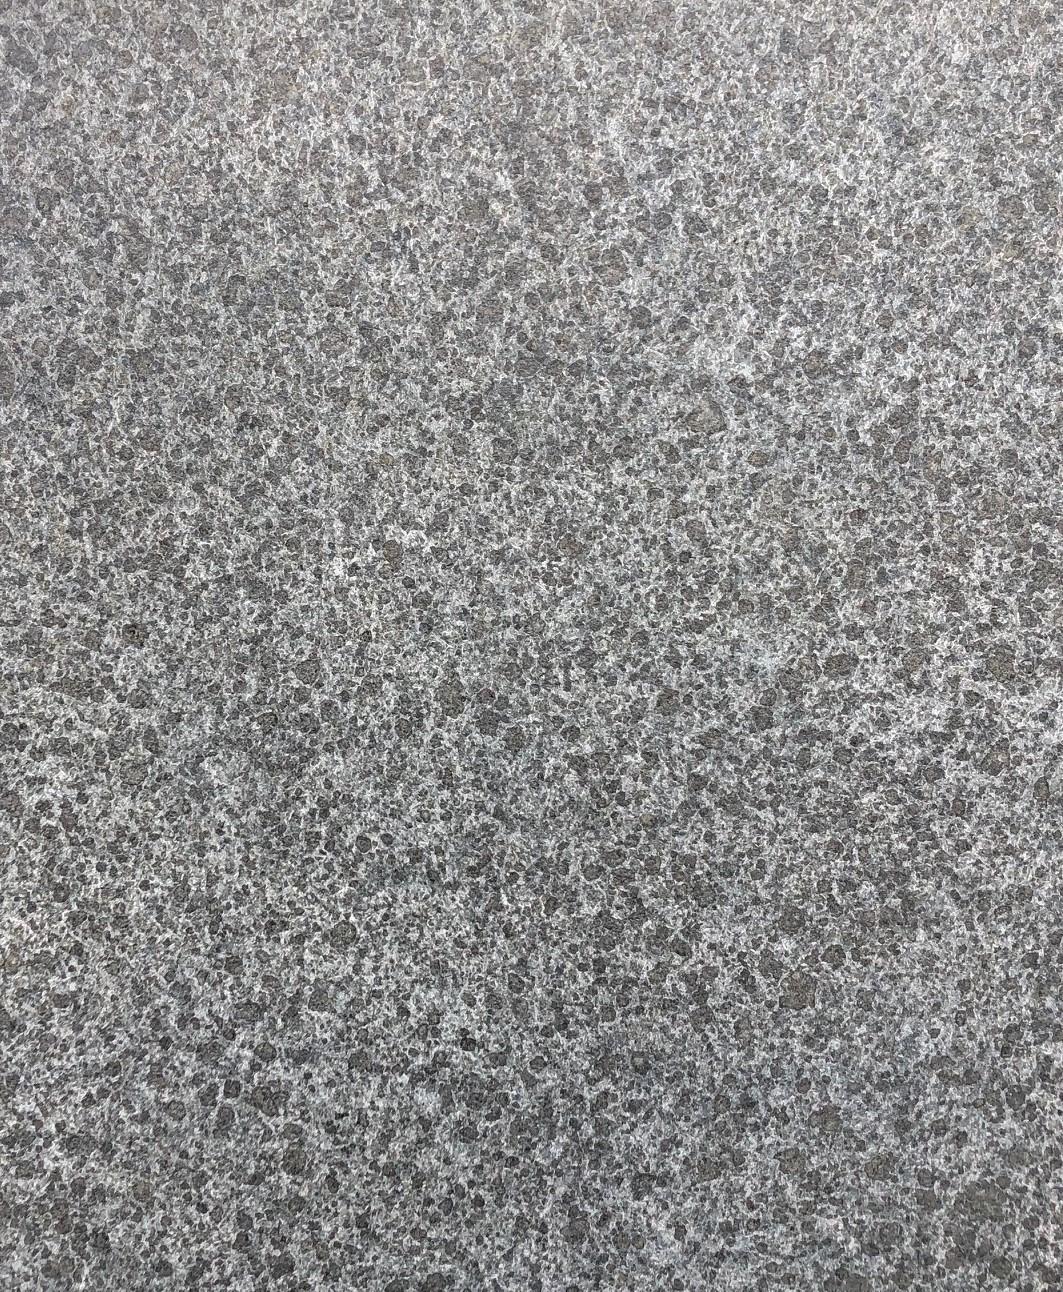 Raven Granite